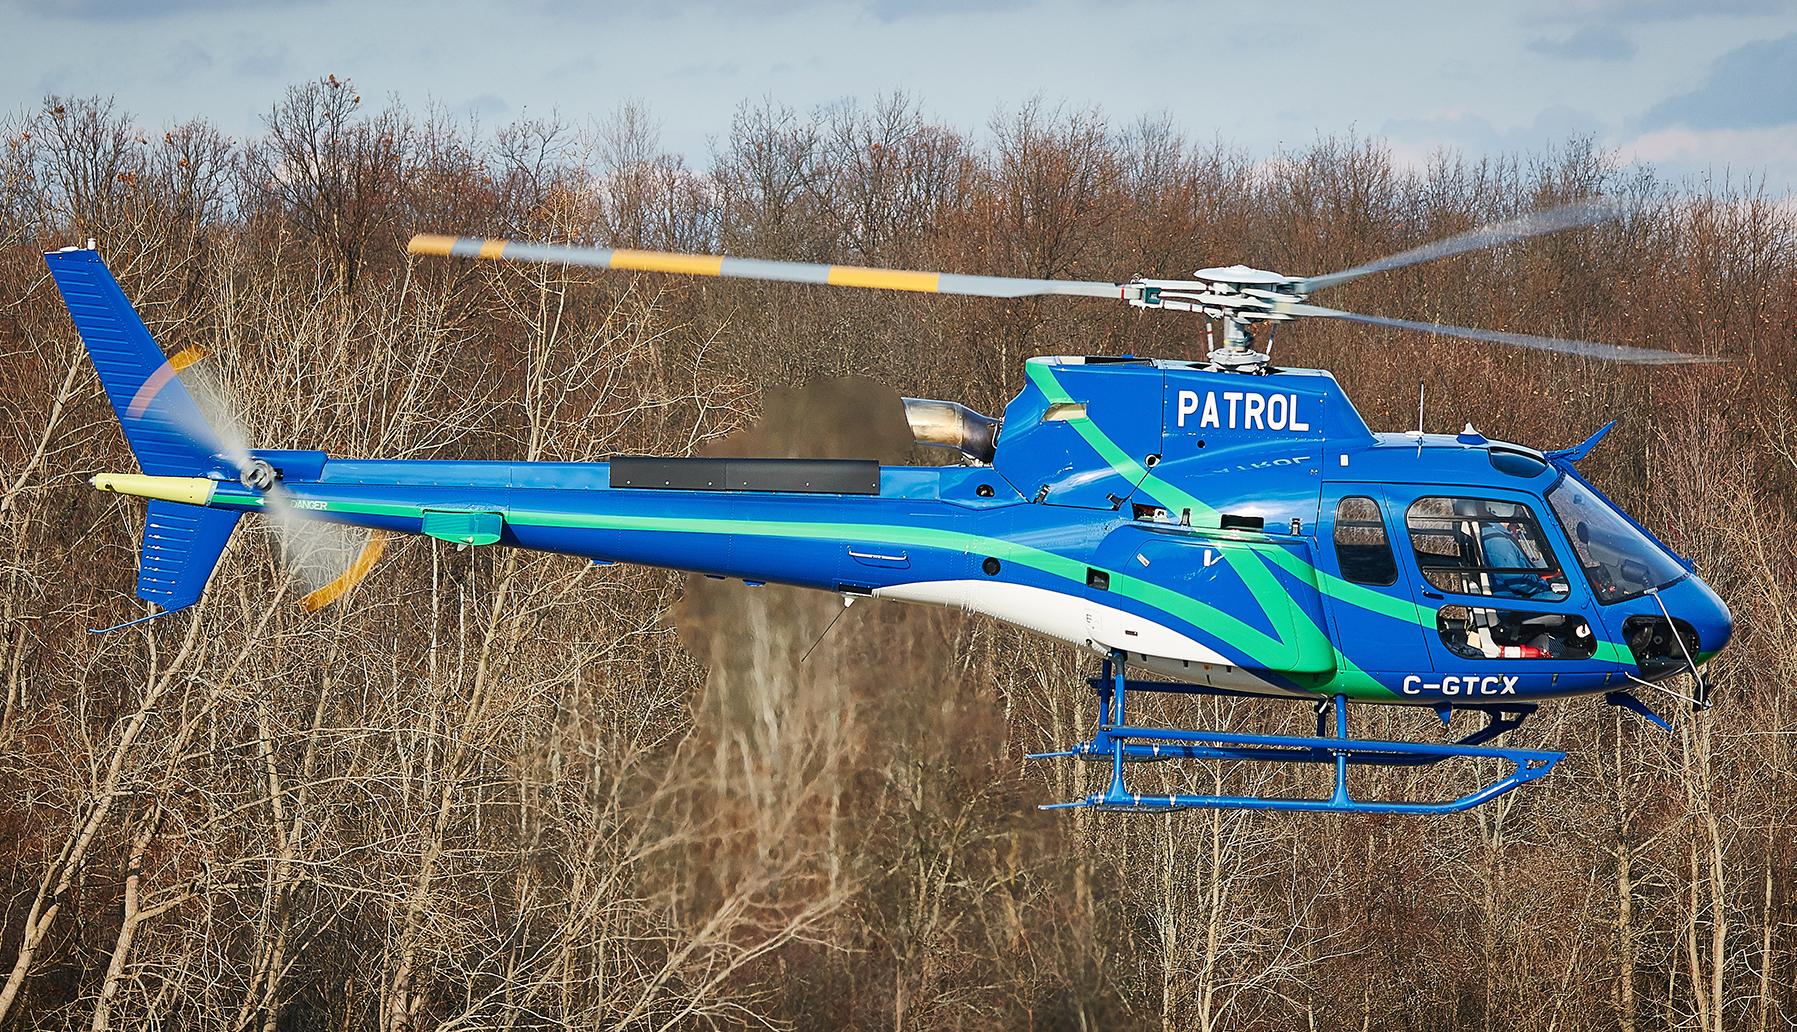 H125 in flight